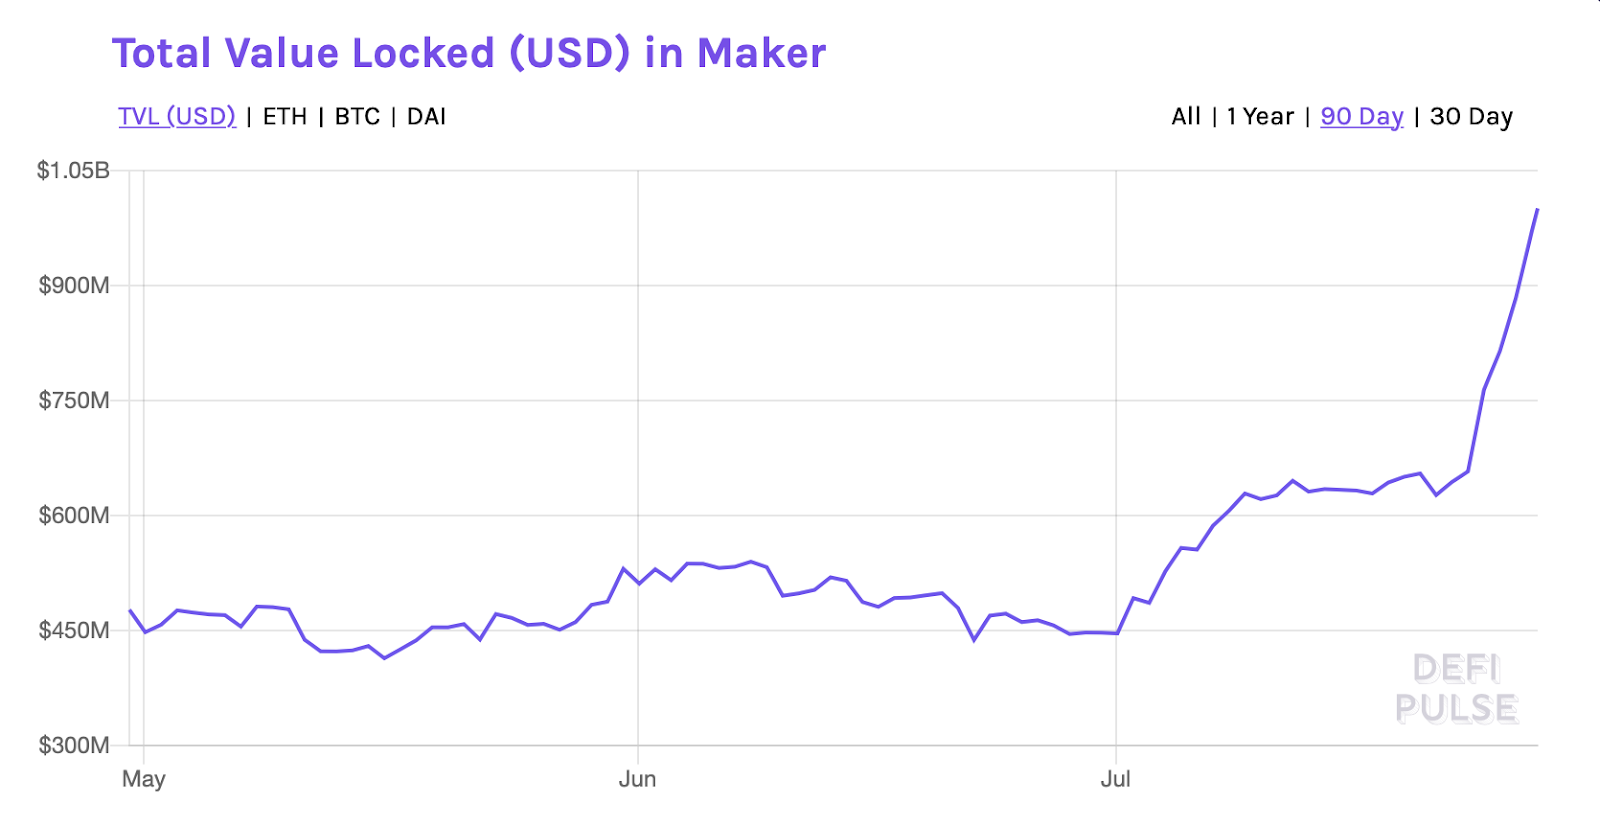 Total Value Locked (USD) in Maker